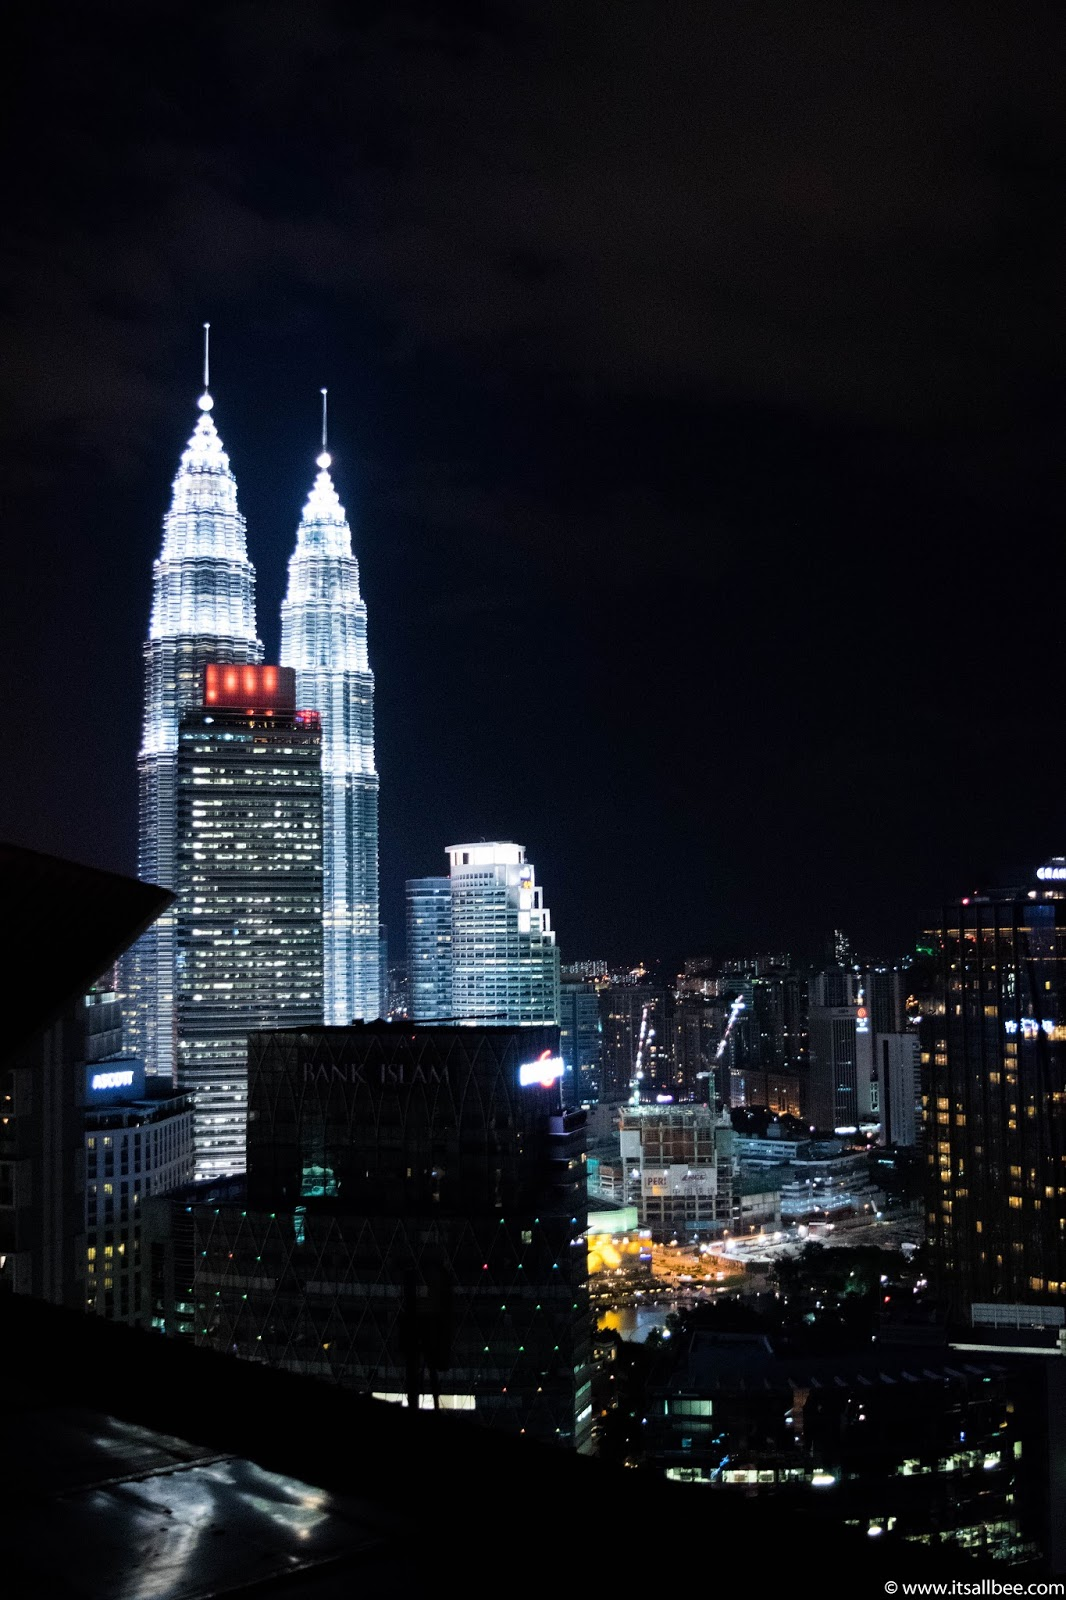 Malaysia's Best Kept Secret : Helipad Lounge Bar In Kuala Lumpur